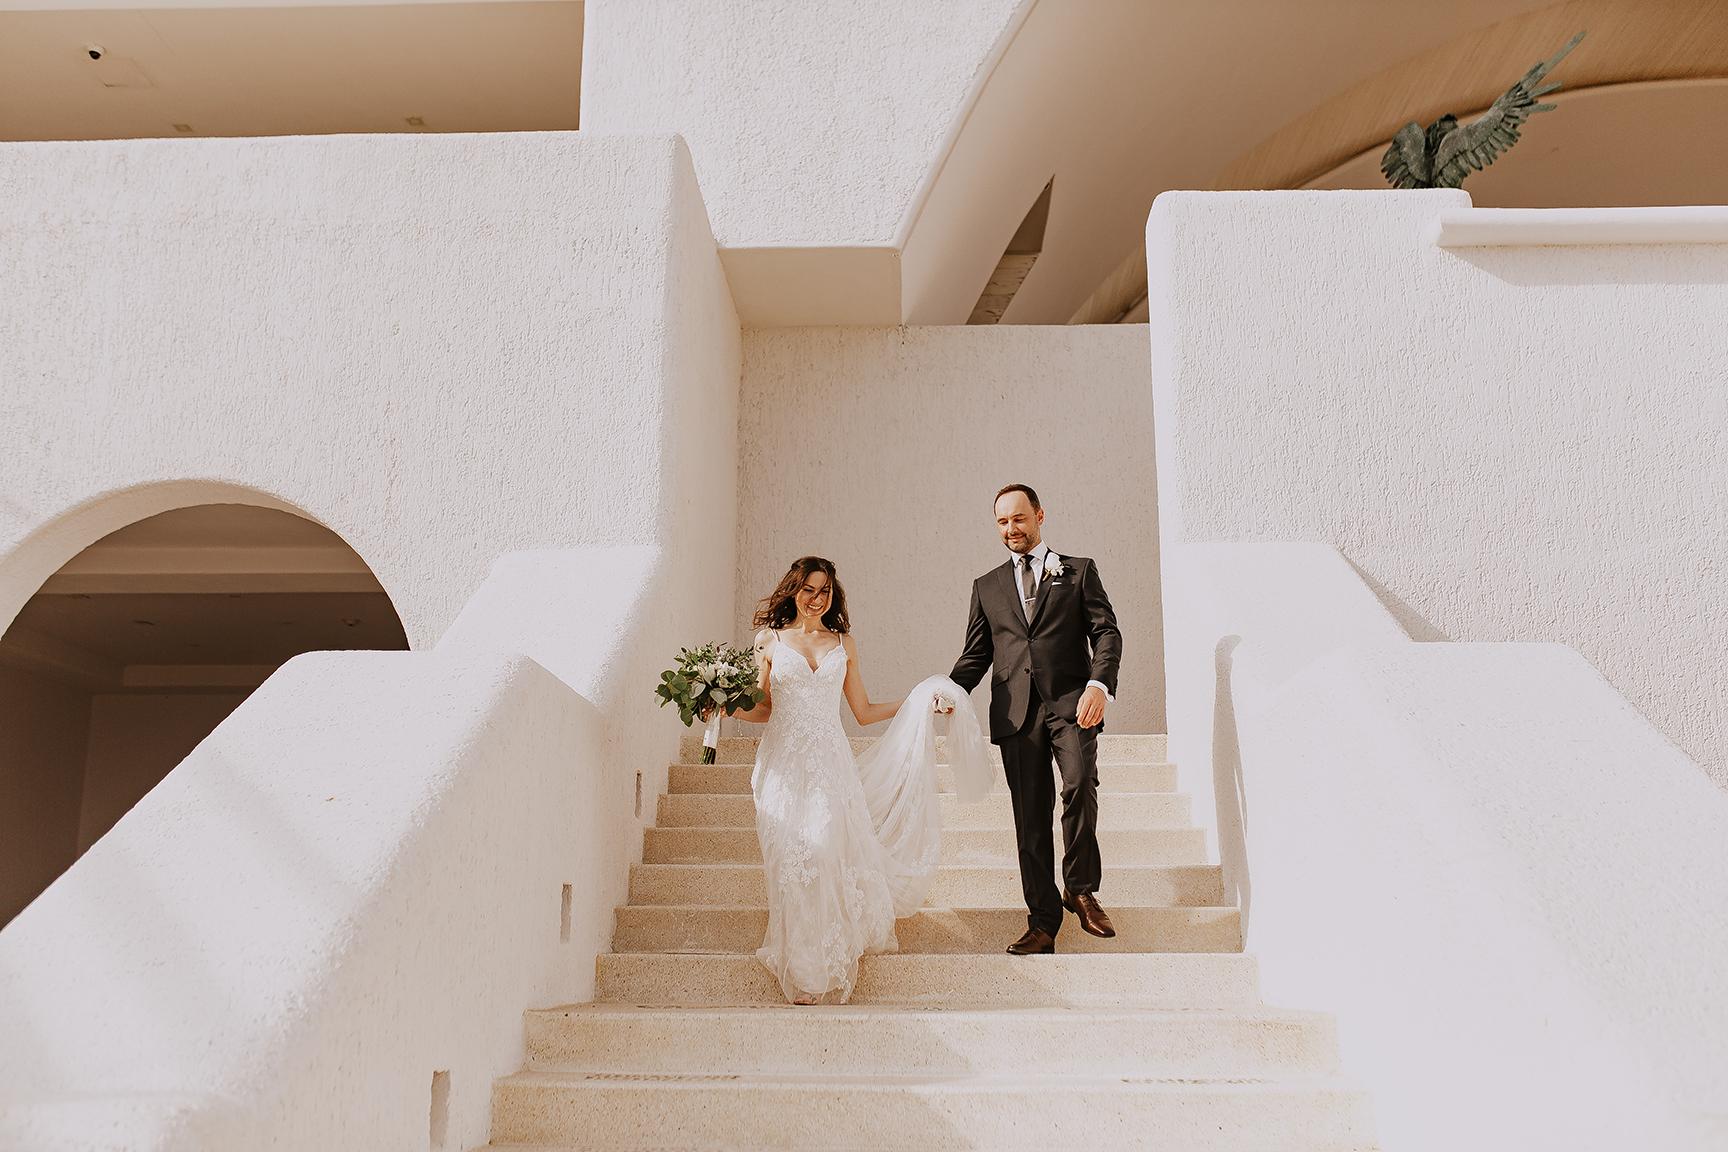 Lindsei+James_cabo_wedding_331.jpg